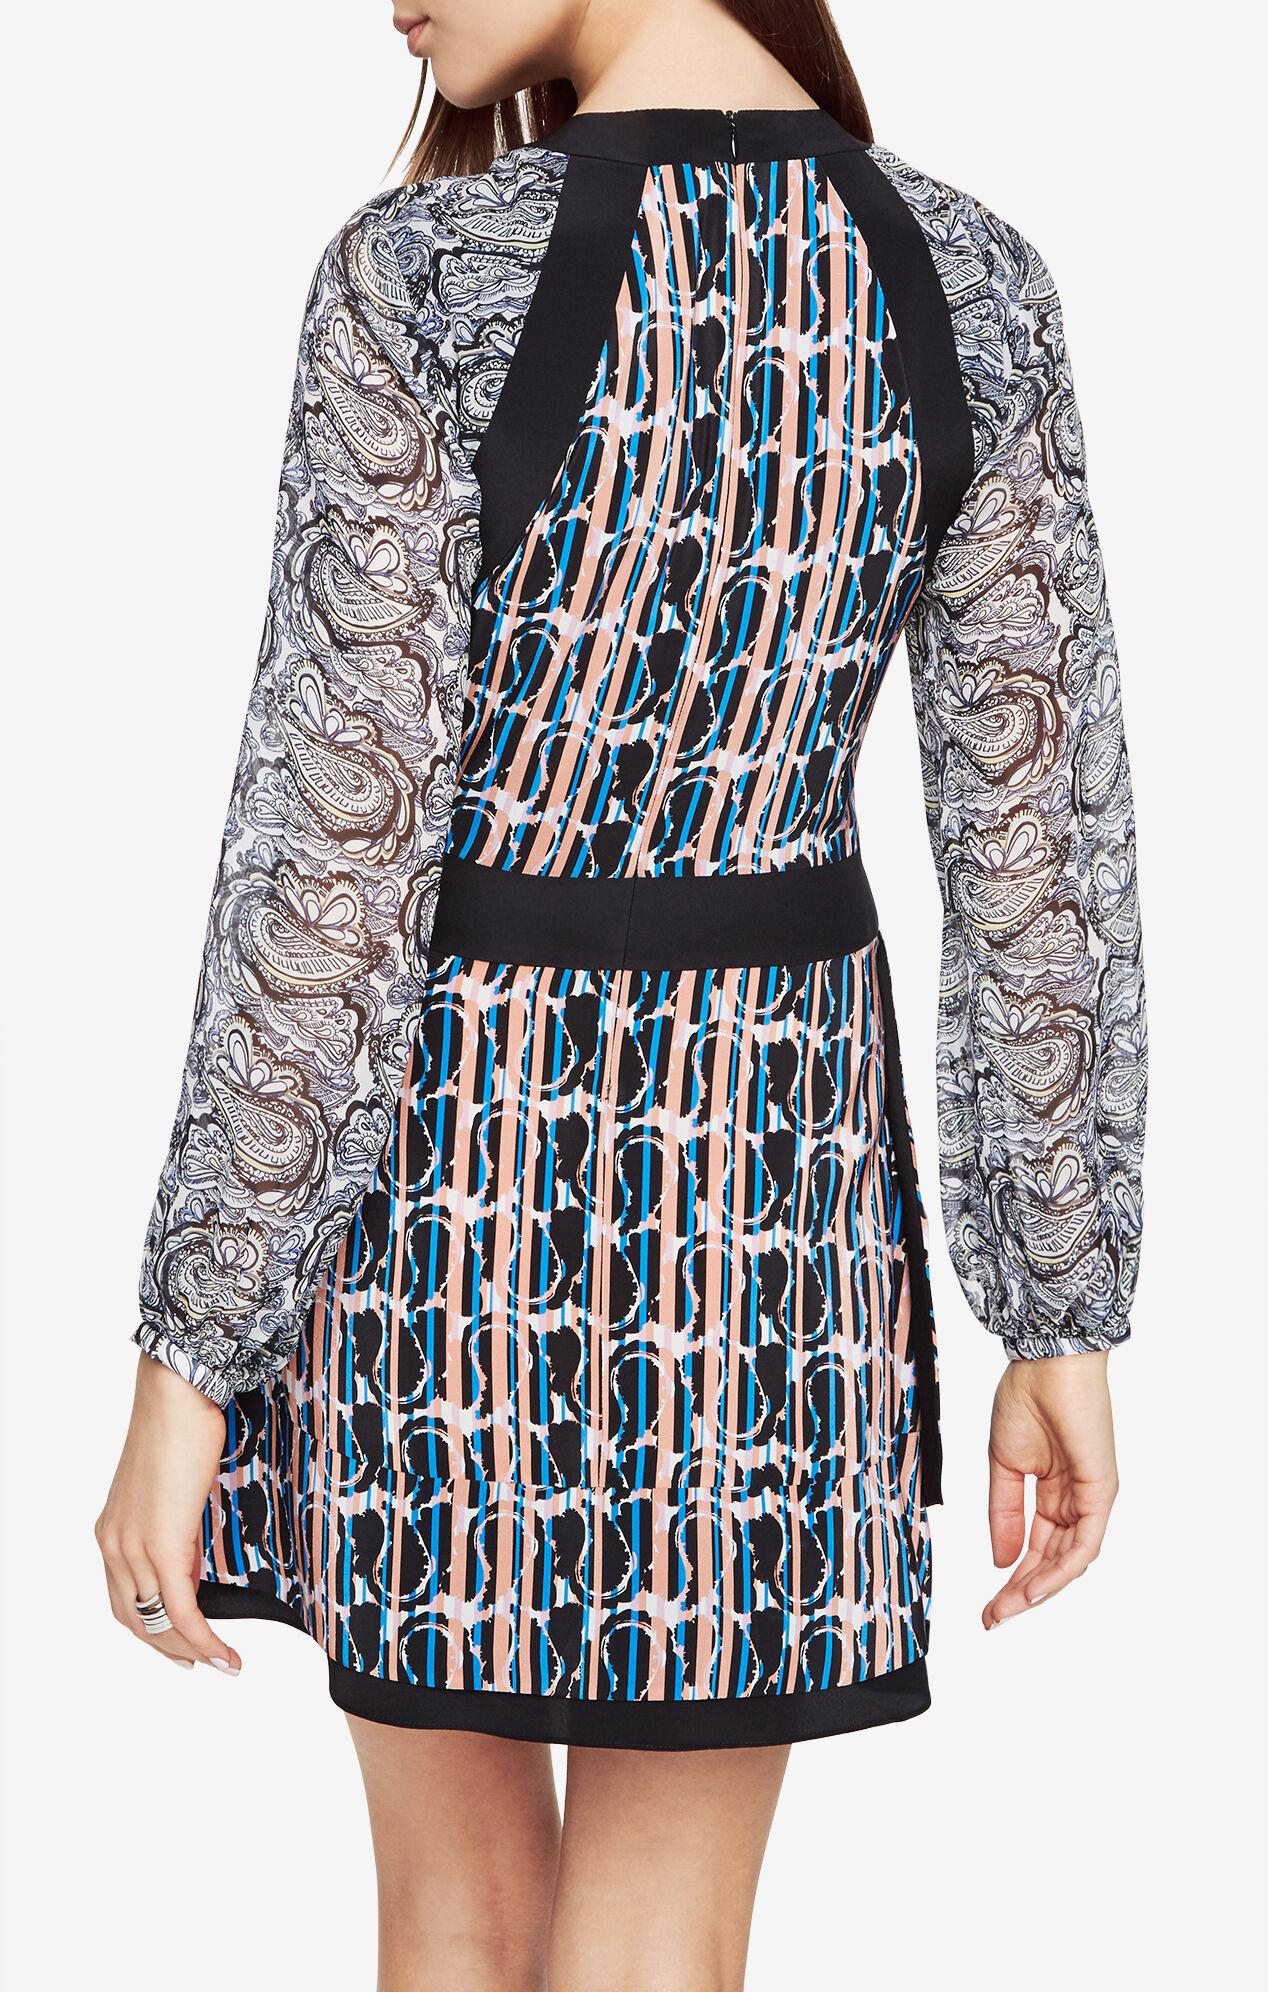 Tallulah Paisley Printed Dress